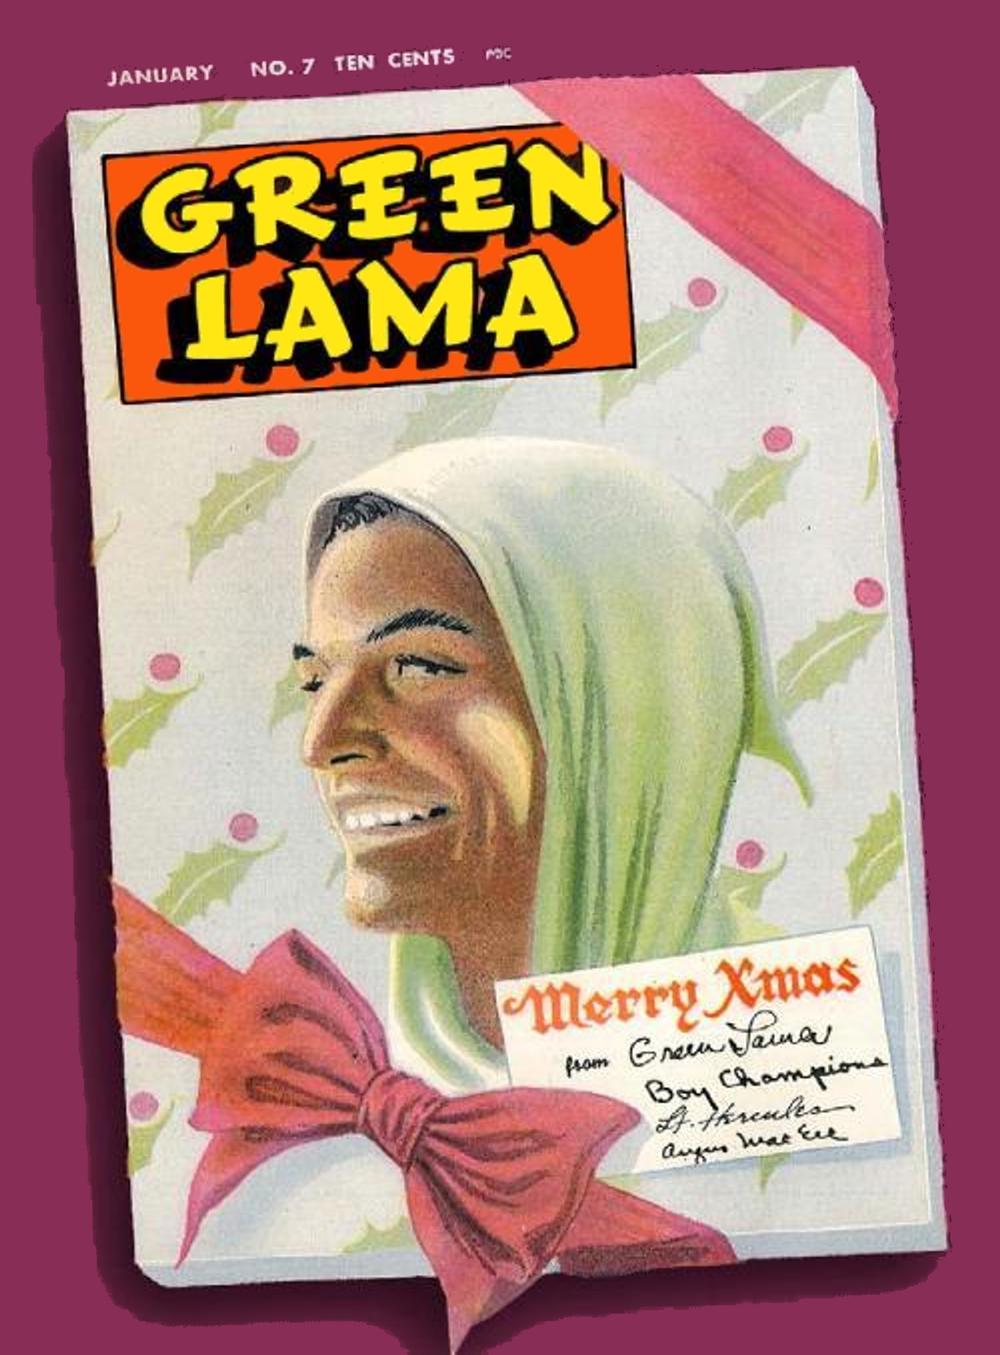 Green-Lama-7.png